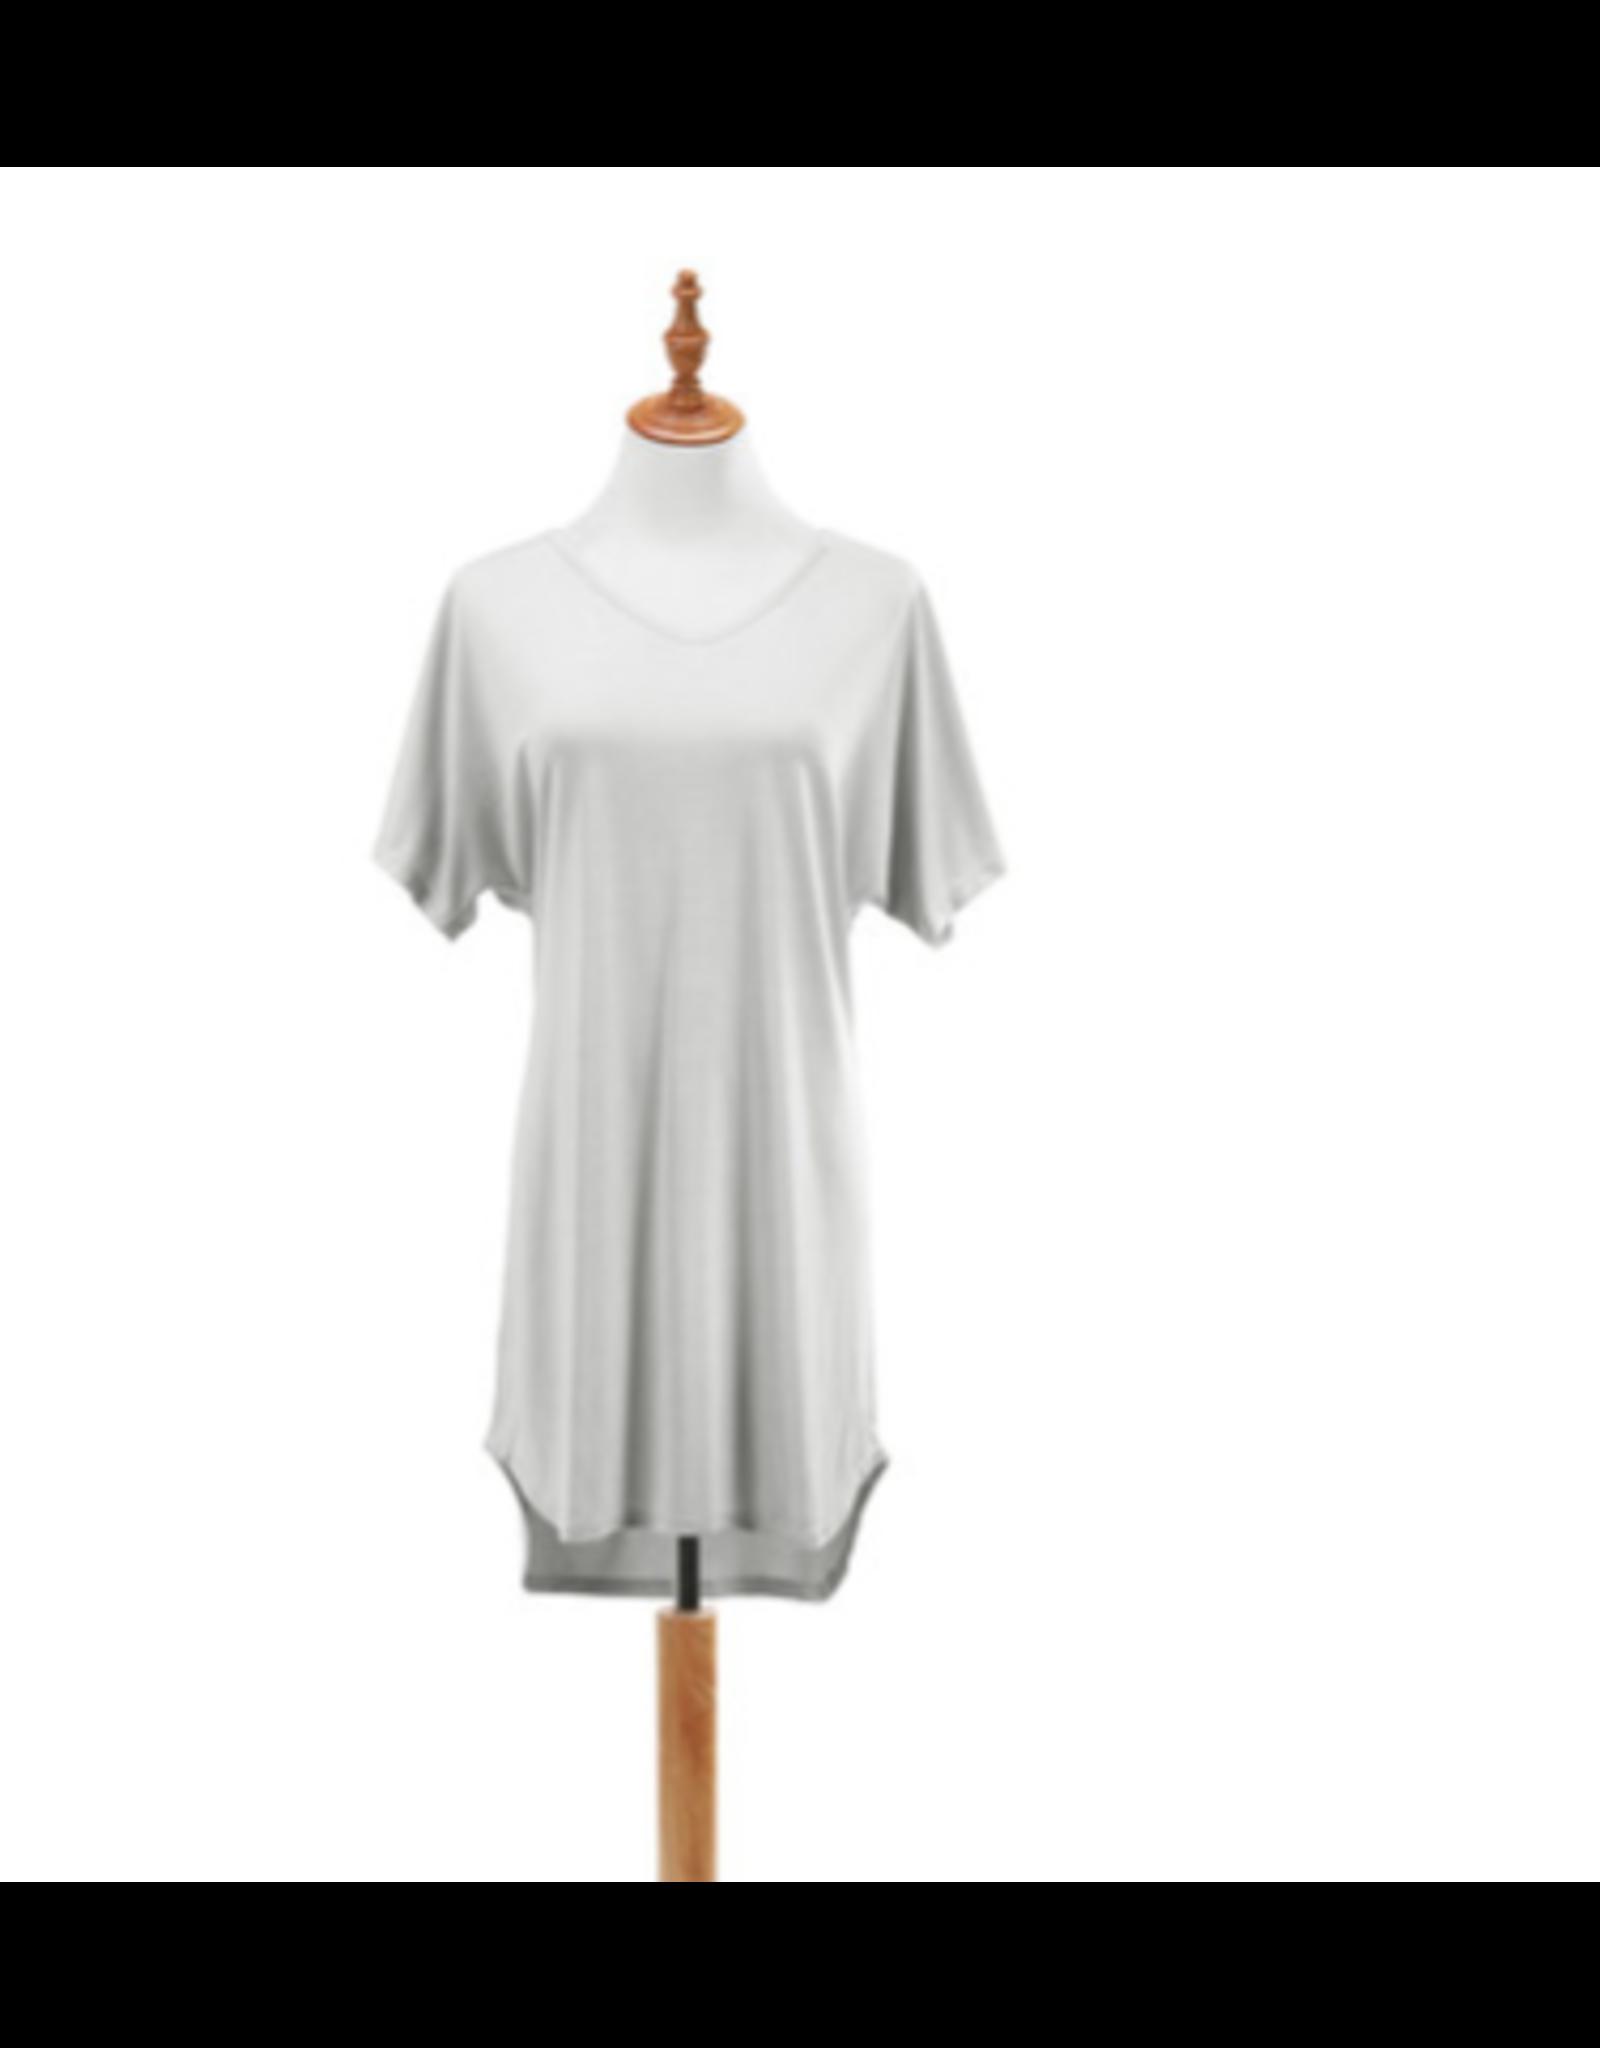 Bamboo Long Lounge Shirt, pebble S/M